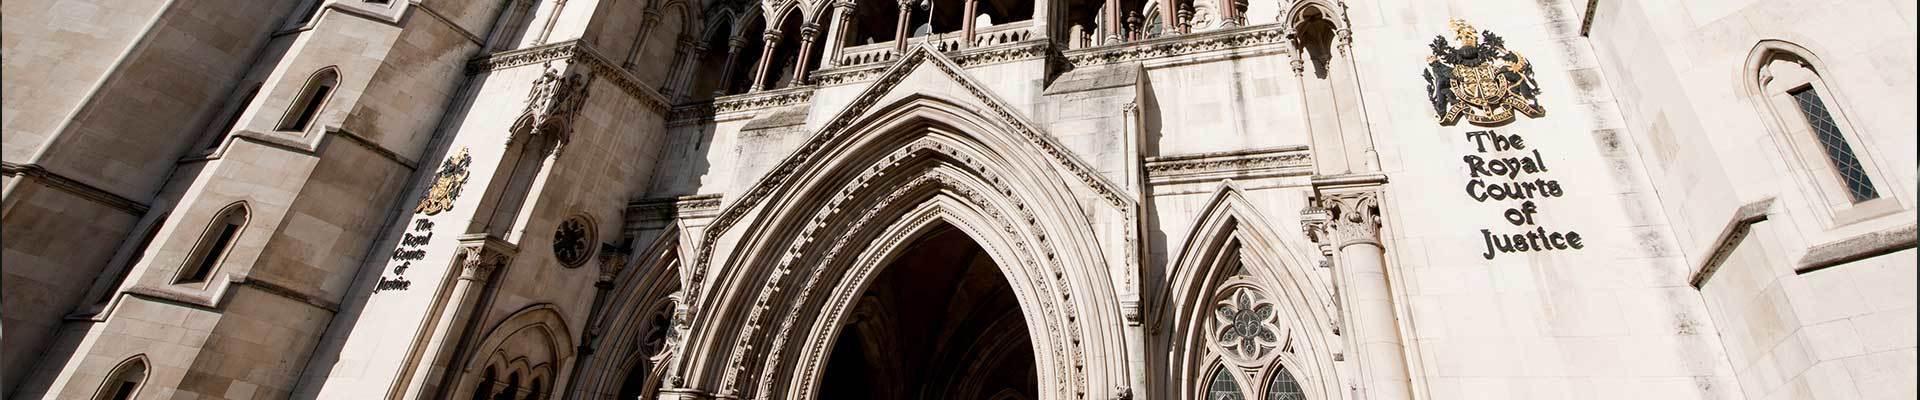 Criminal Solicitors London Area, Personal Injury London Area, Immigration Solicitors London Area